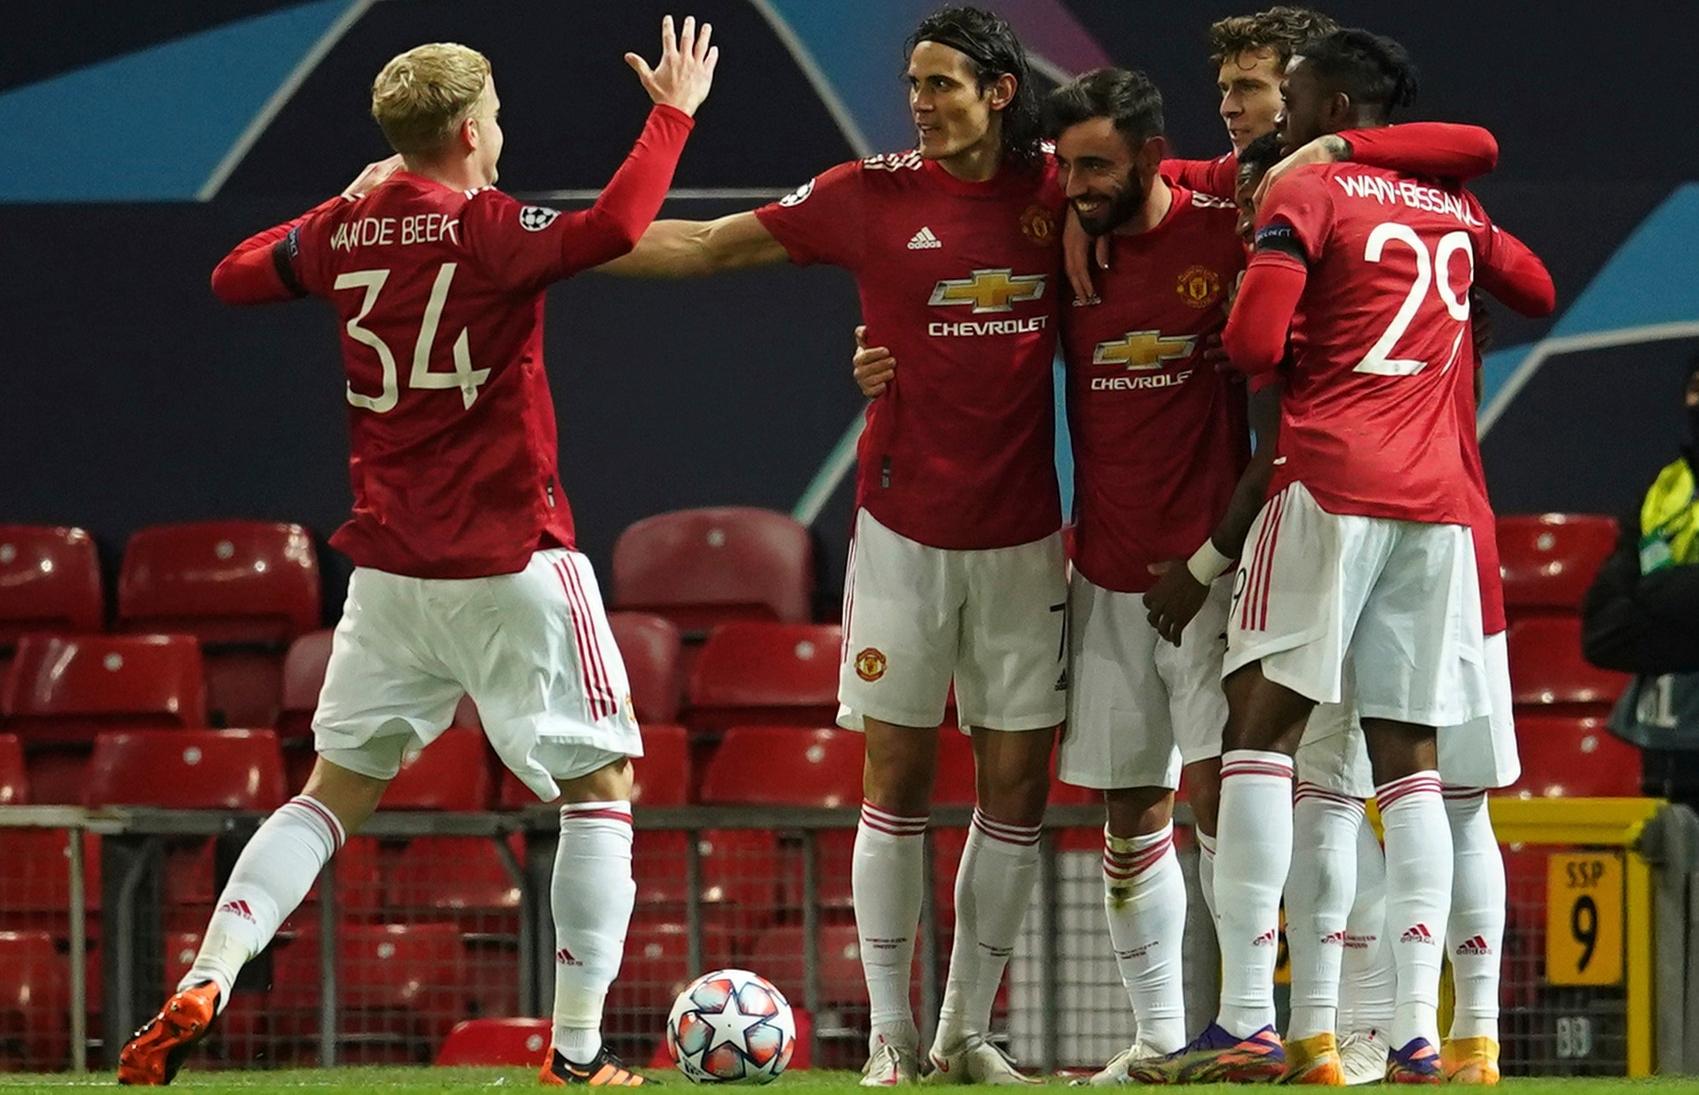 West Ham Vs Manchester United Live Stream How To Watch English Premier League 2020 Sat Dec 5 Masslive Com